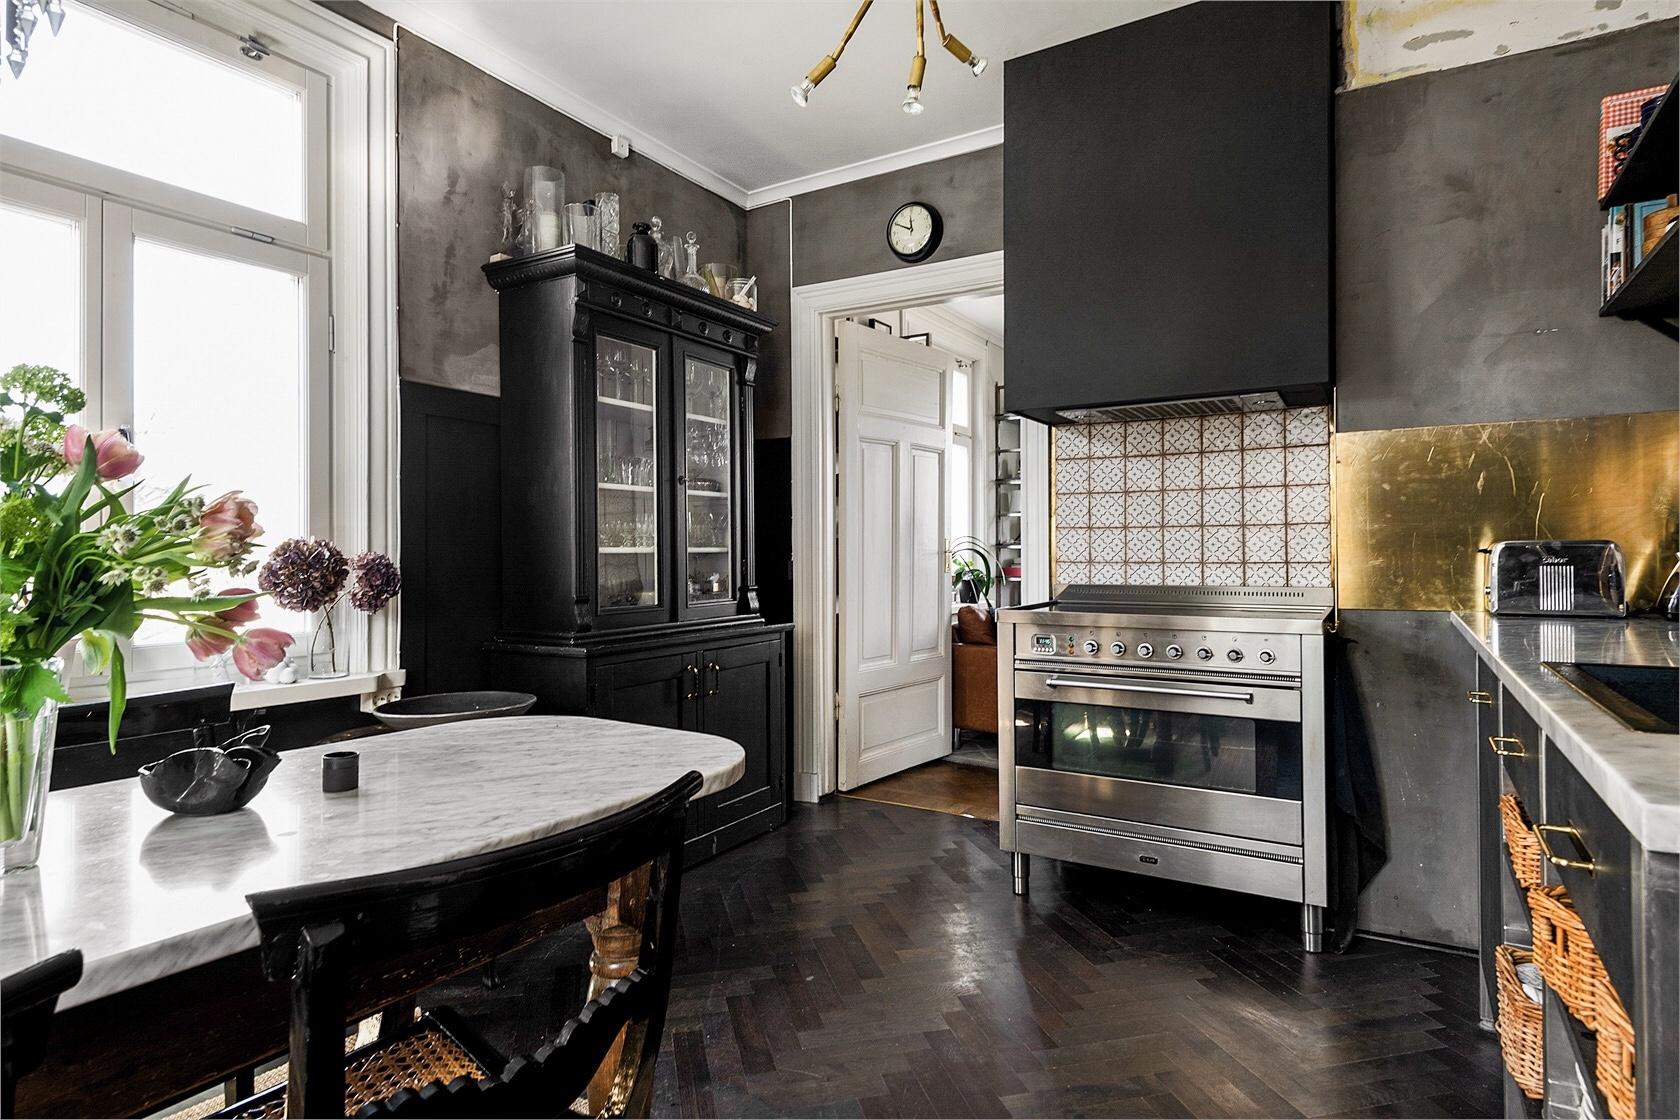 kitchenware-1